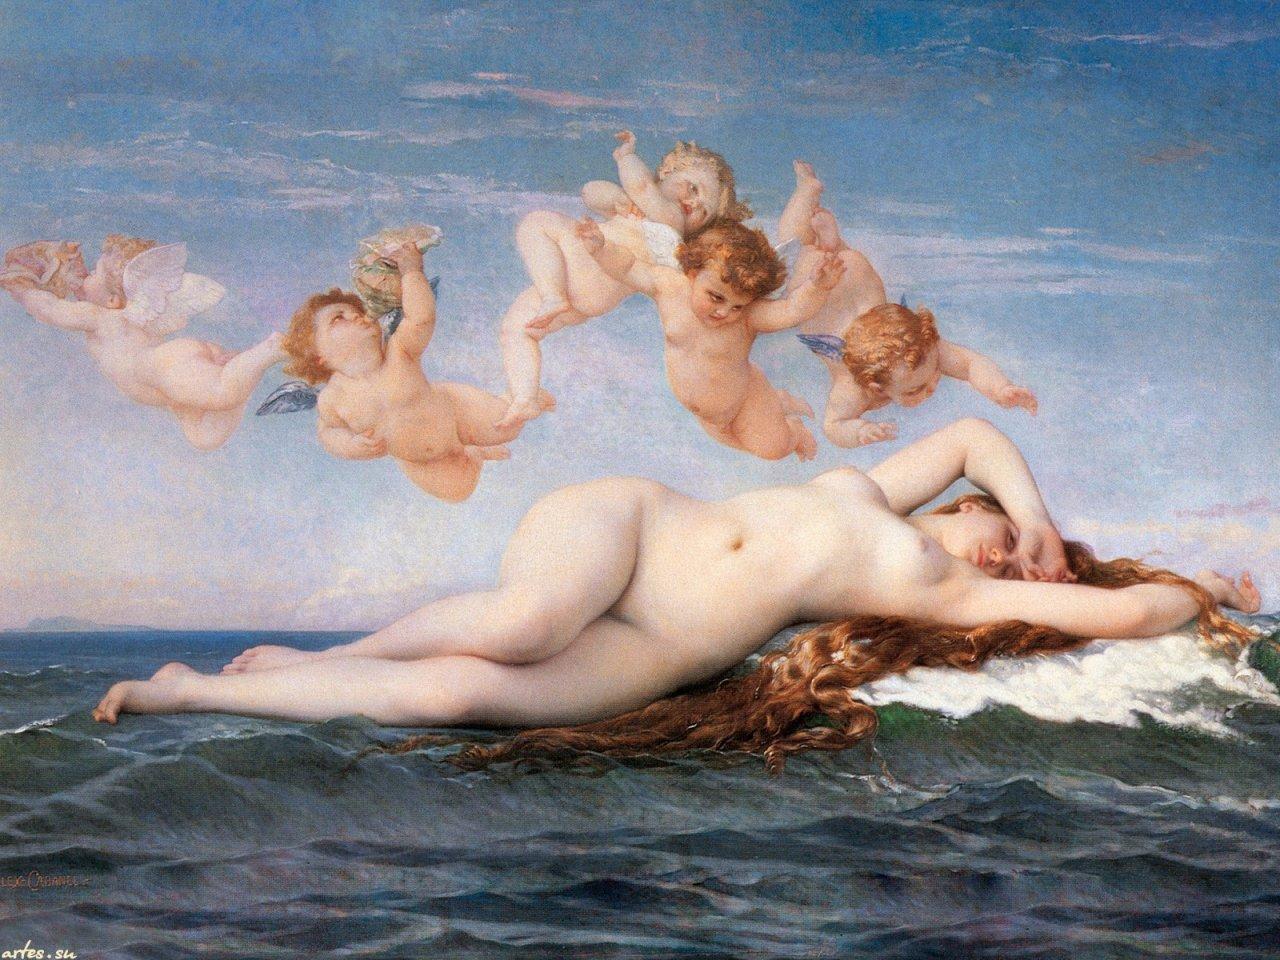 Афродита - богиня желания (1997)